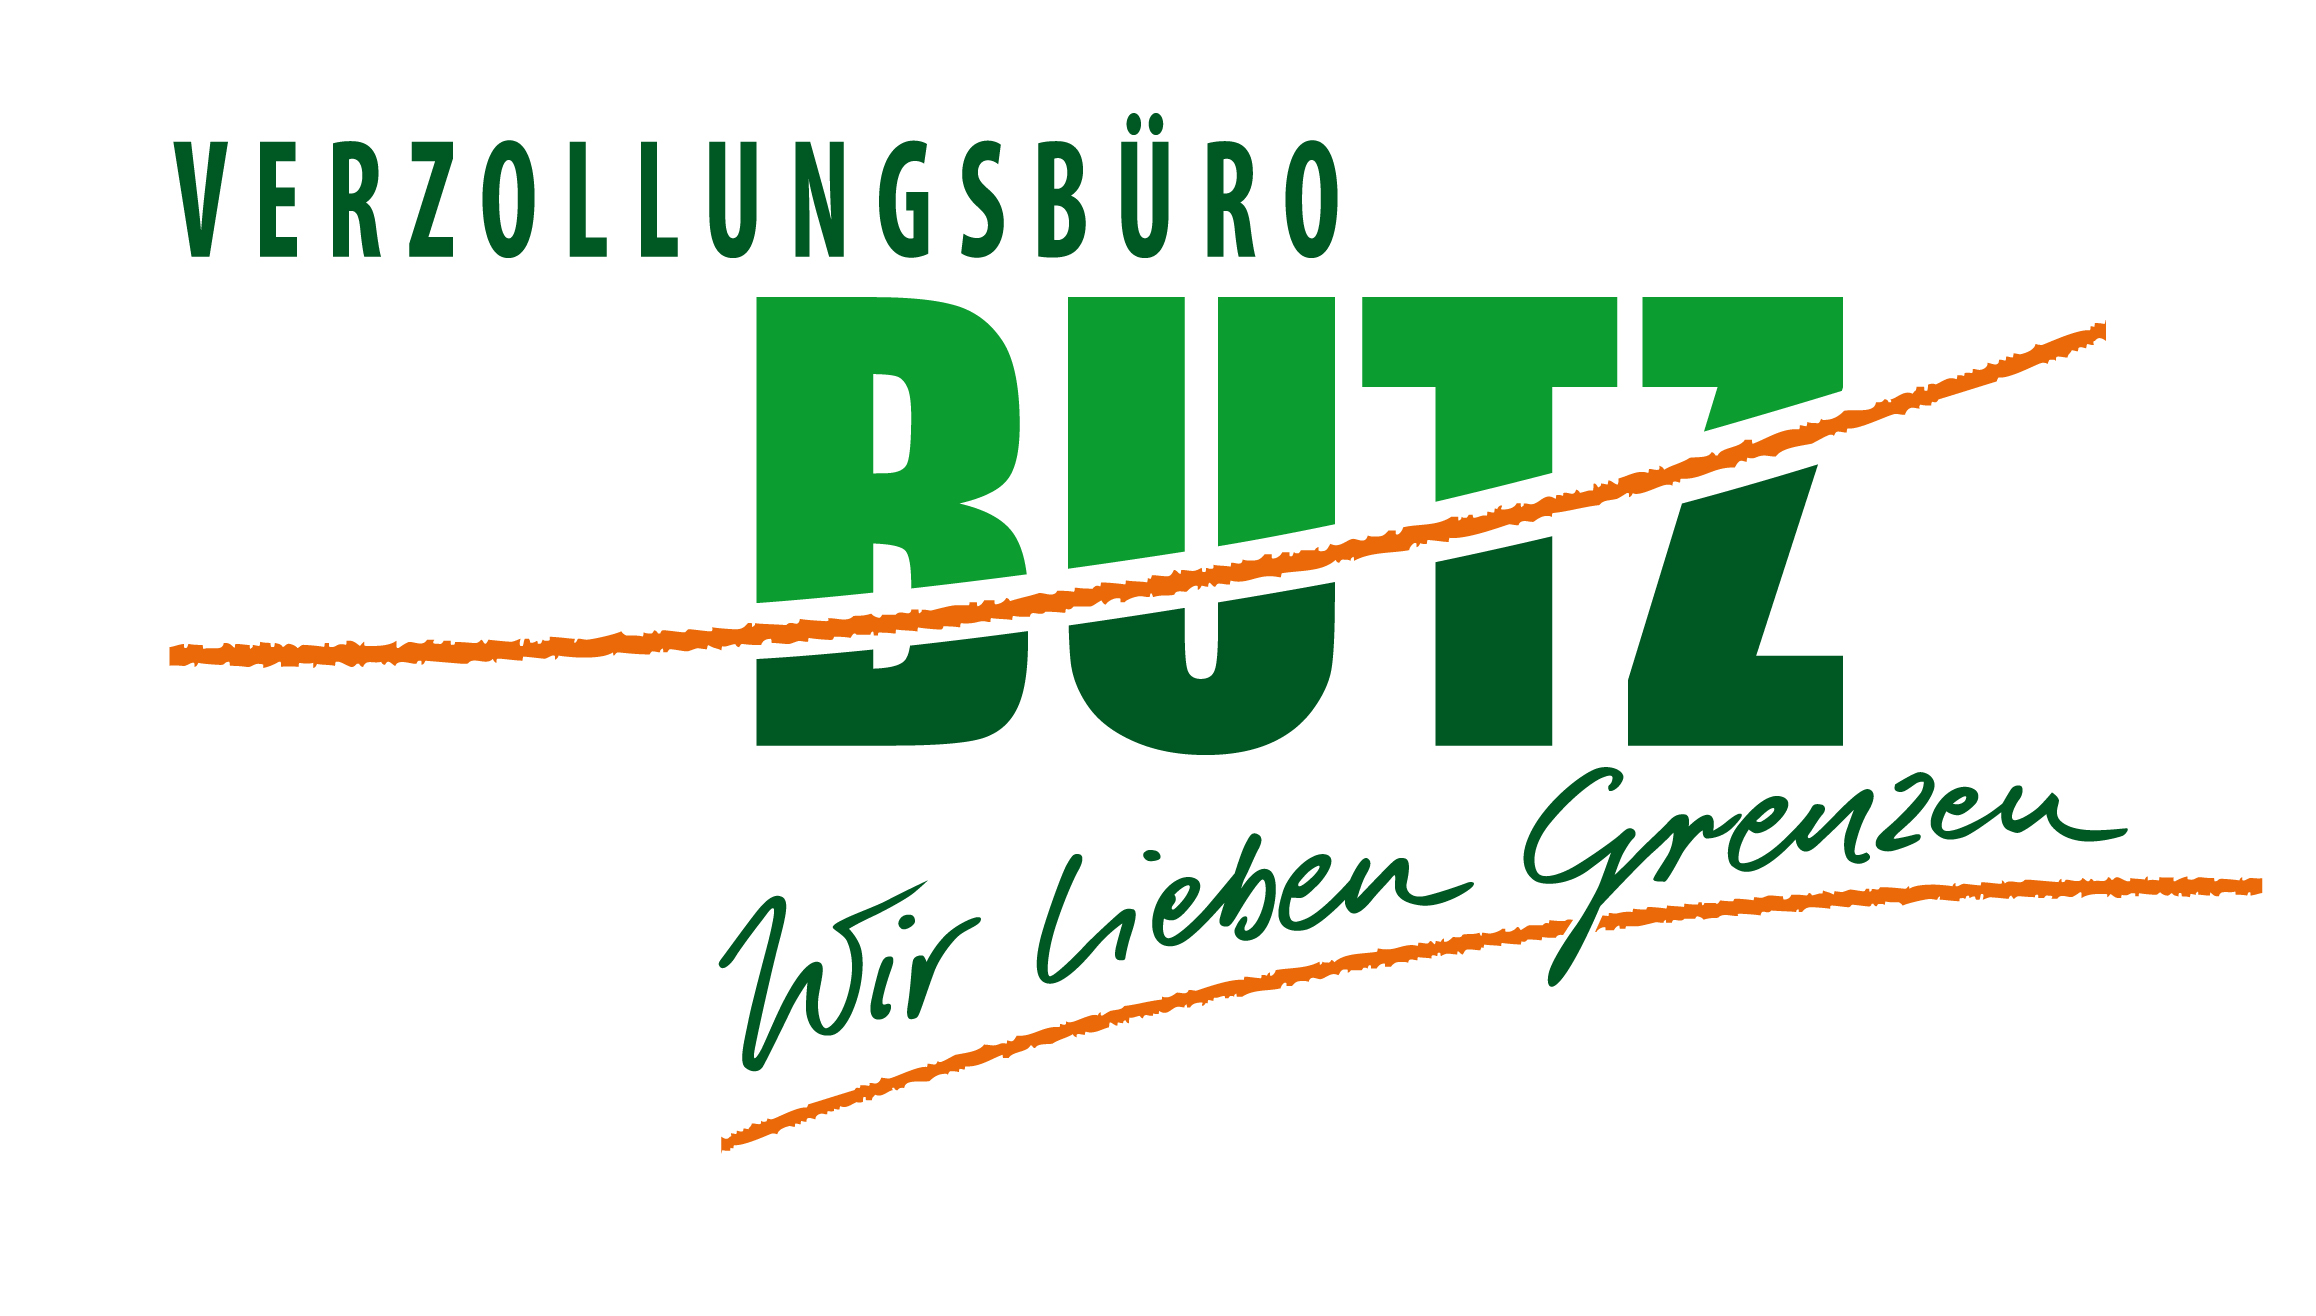 Verzollungsbüro Butz GmbH